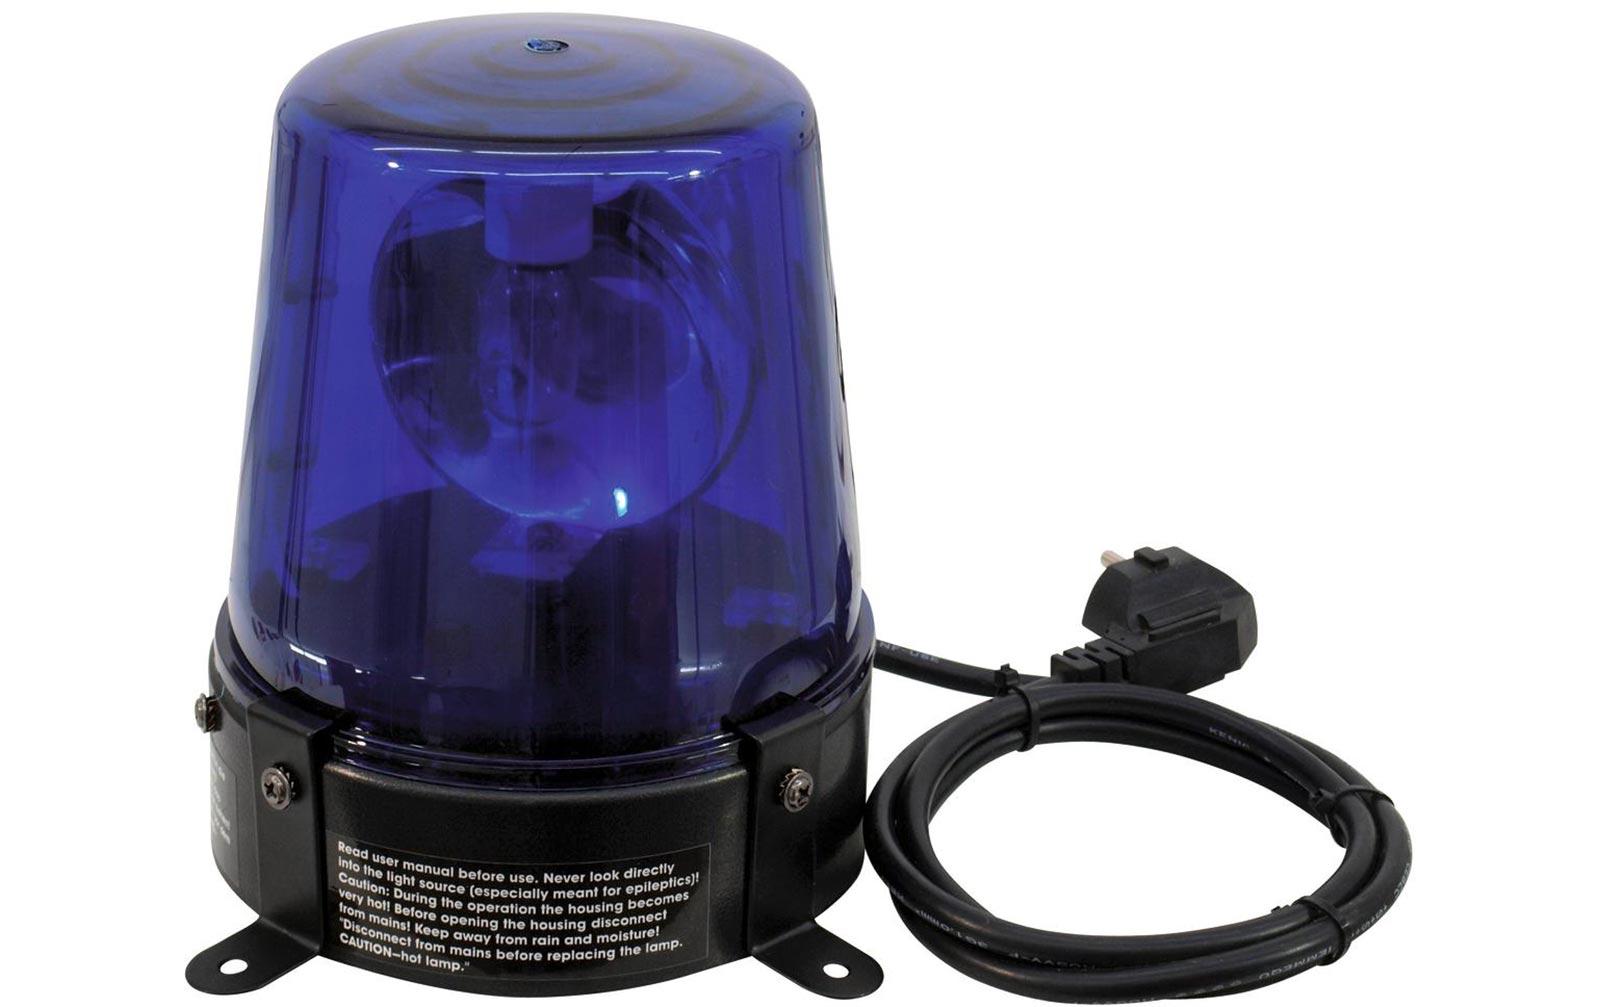 eurolite-polizeilicht-de-1-blau-230v-15w